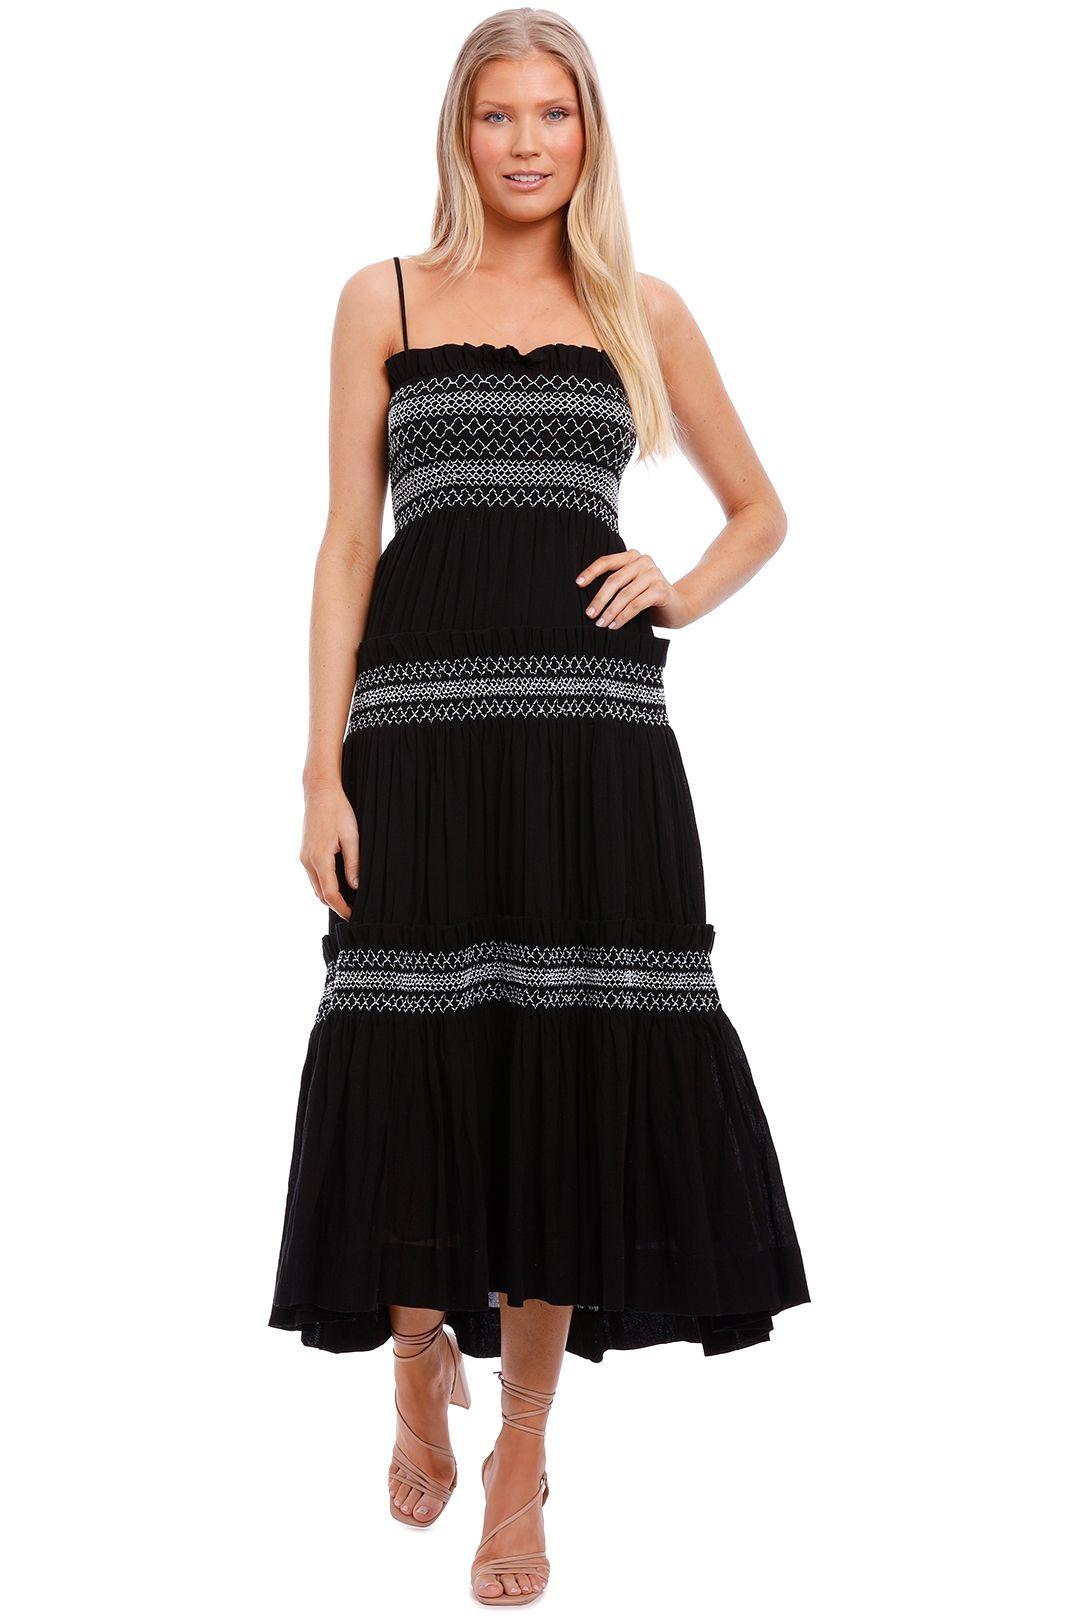 Shona Joy Shirred Tiered Midi Dress